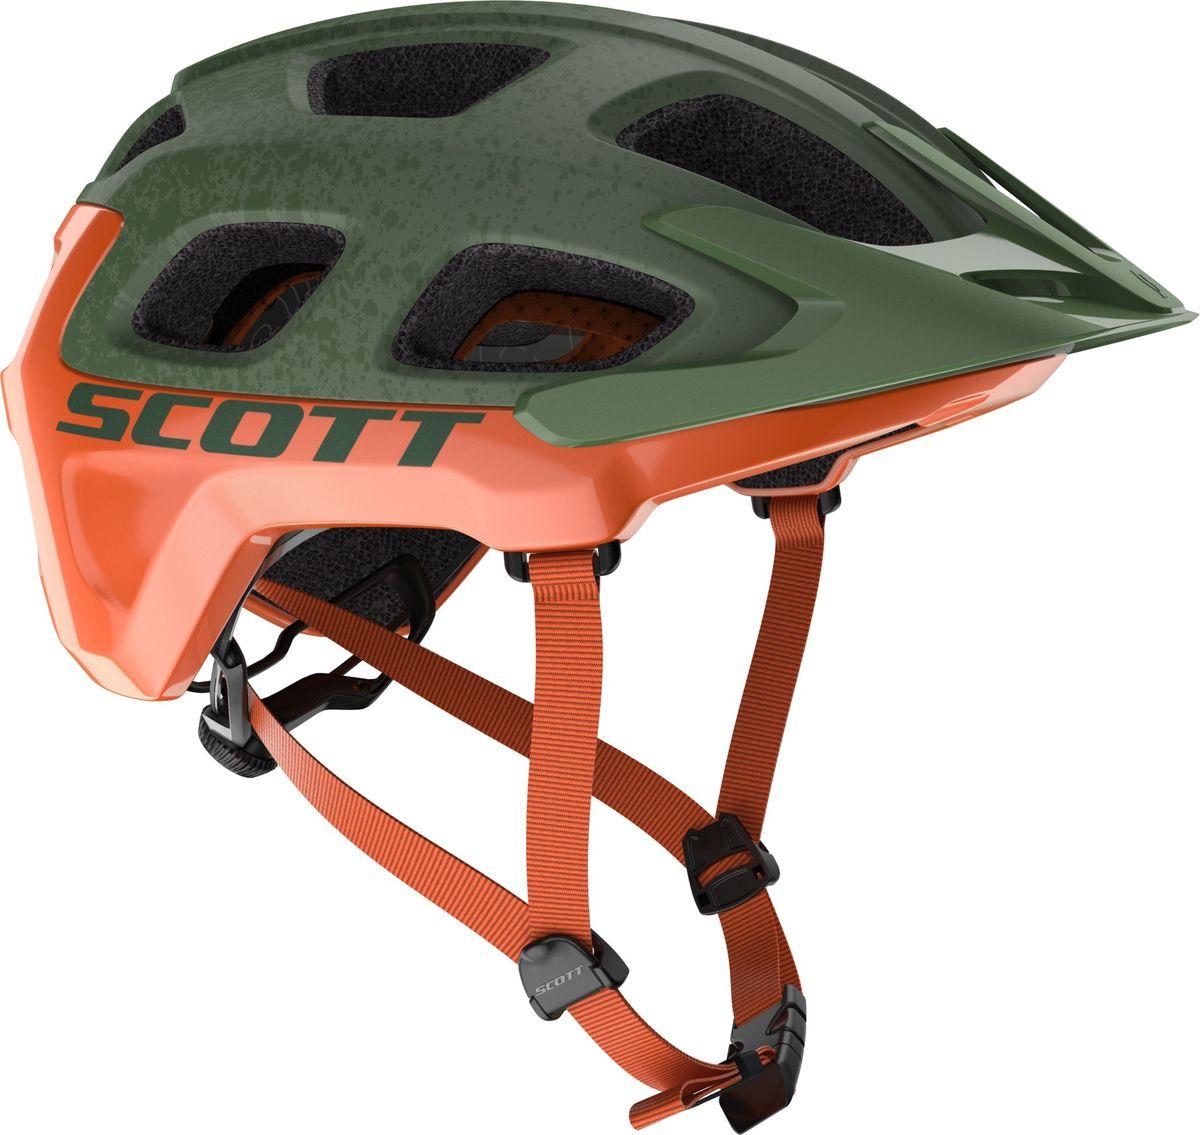 Шлем защитный Scott Vivo Plus, 241070-6154, оранжевый, размер M (55/59)